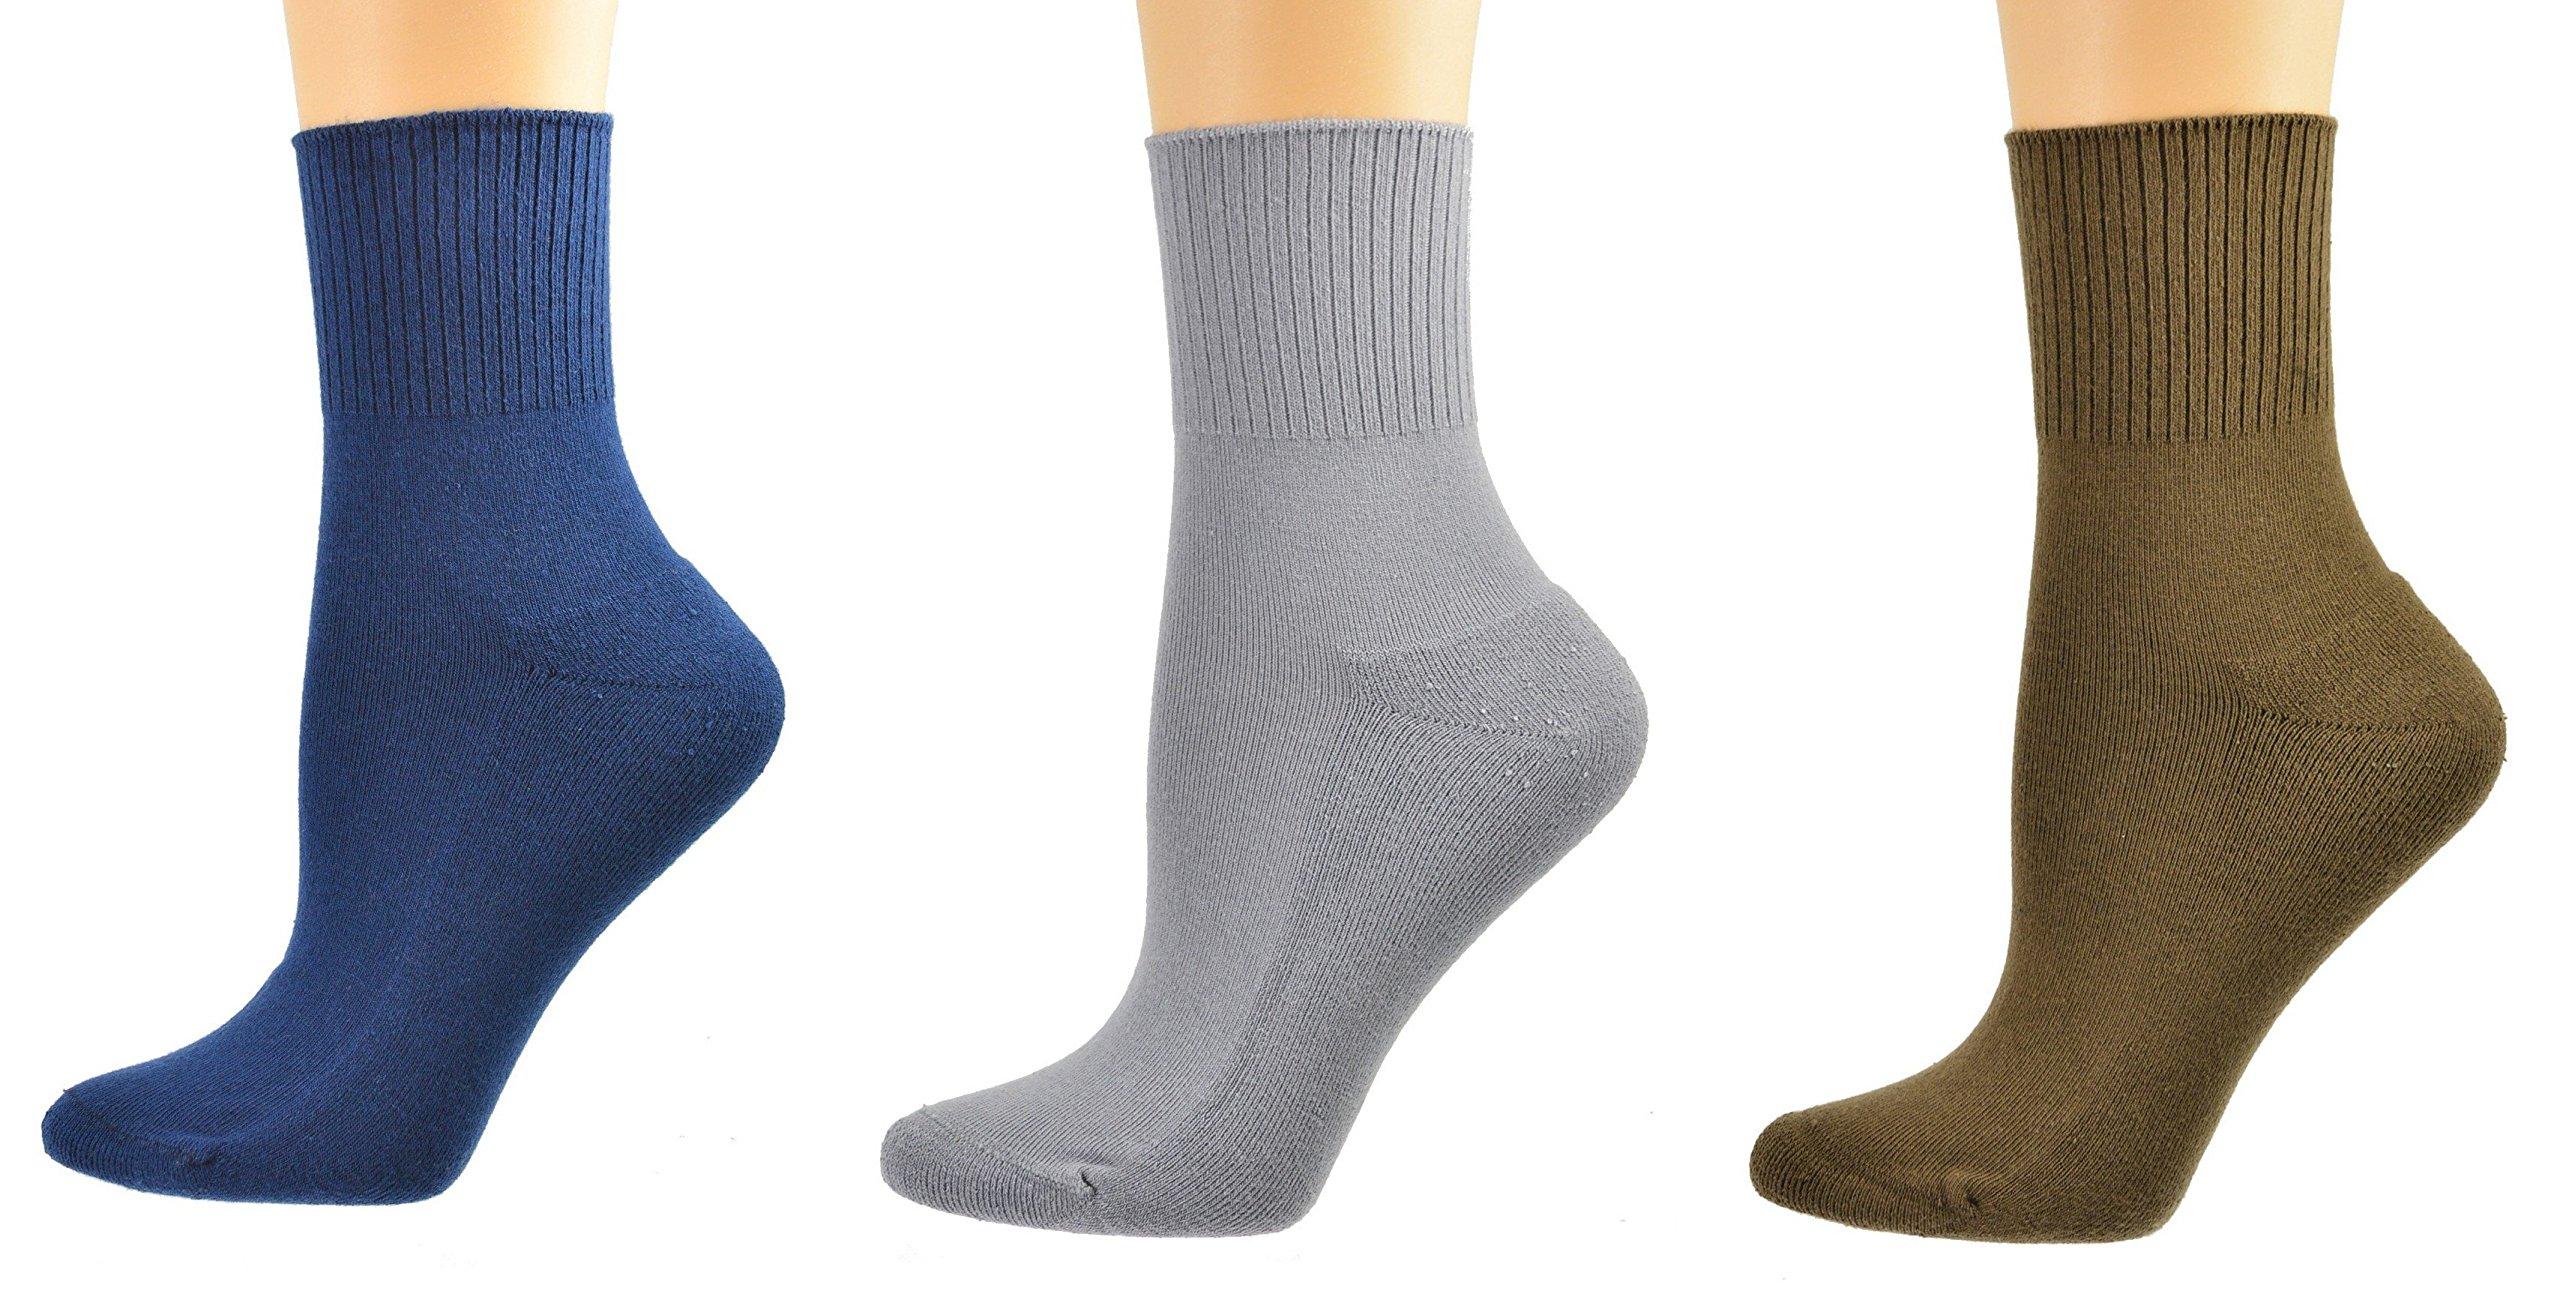 Sierra Socks Diabetic Arthritic Womens Ankle Cushioned Sole Smooth Toe 3 Pair Pack (9-11, Navy/Brown/Gray)